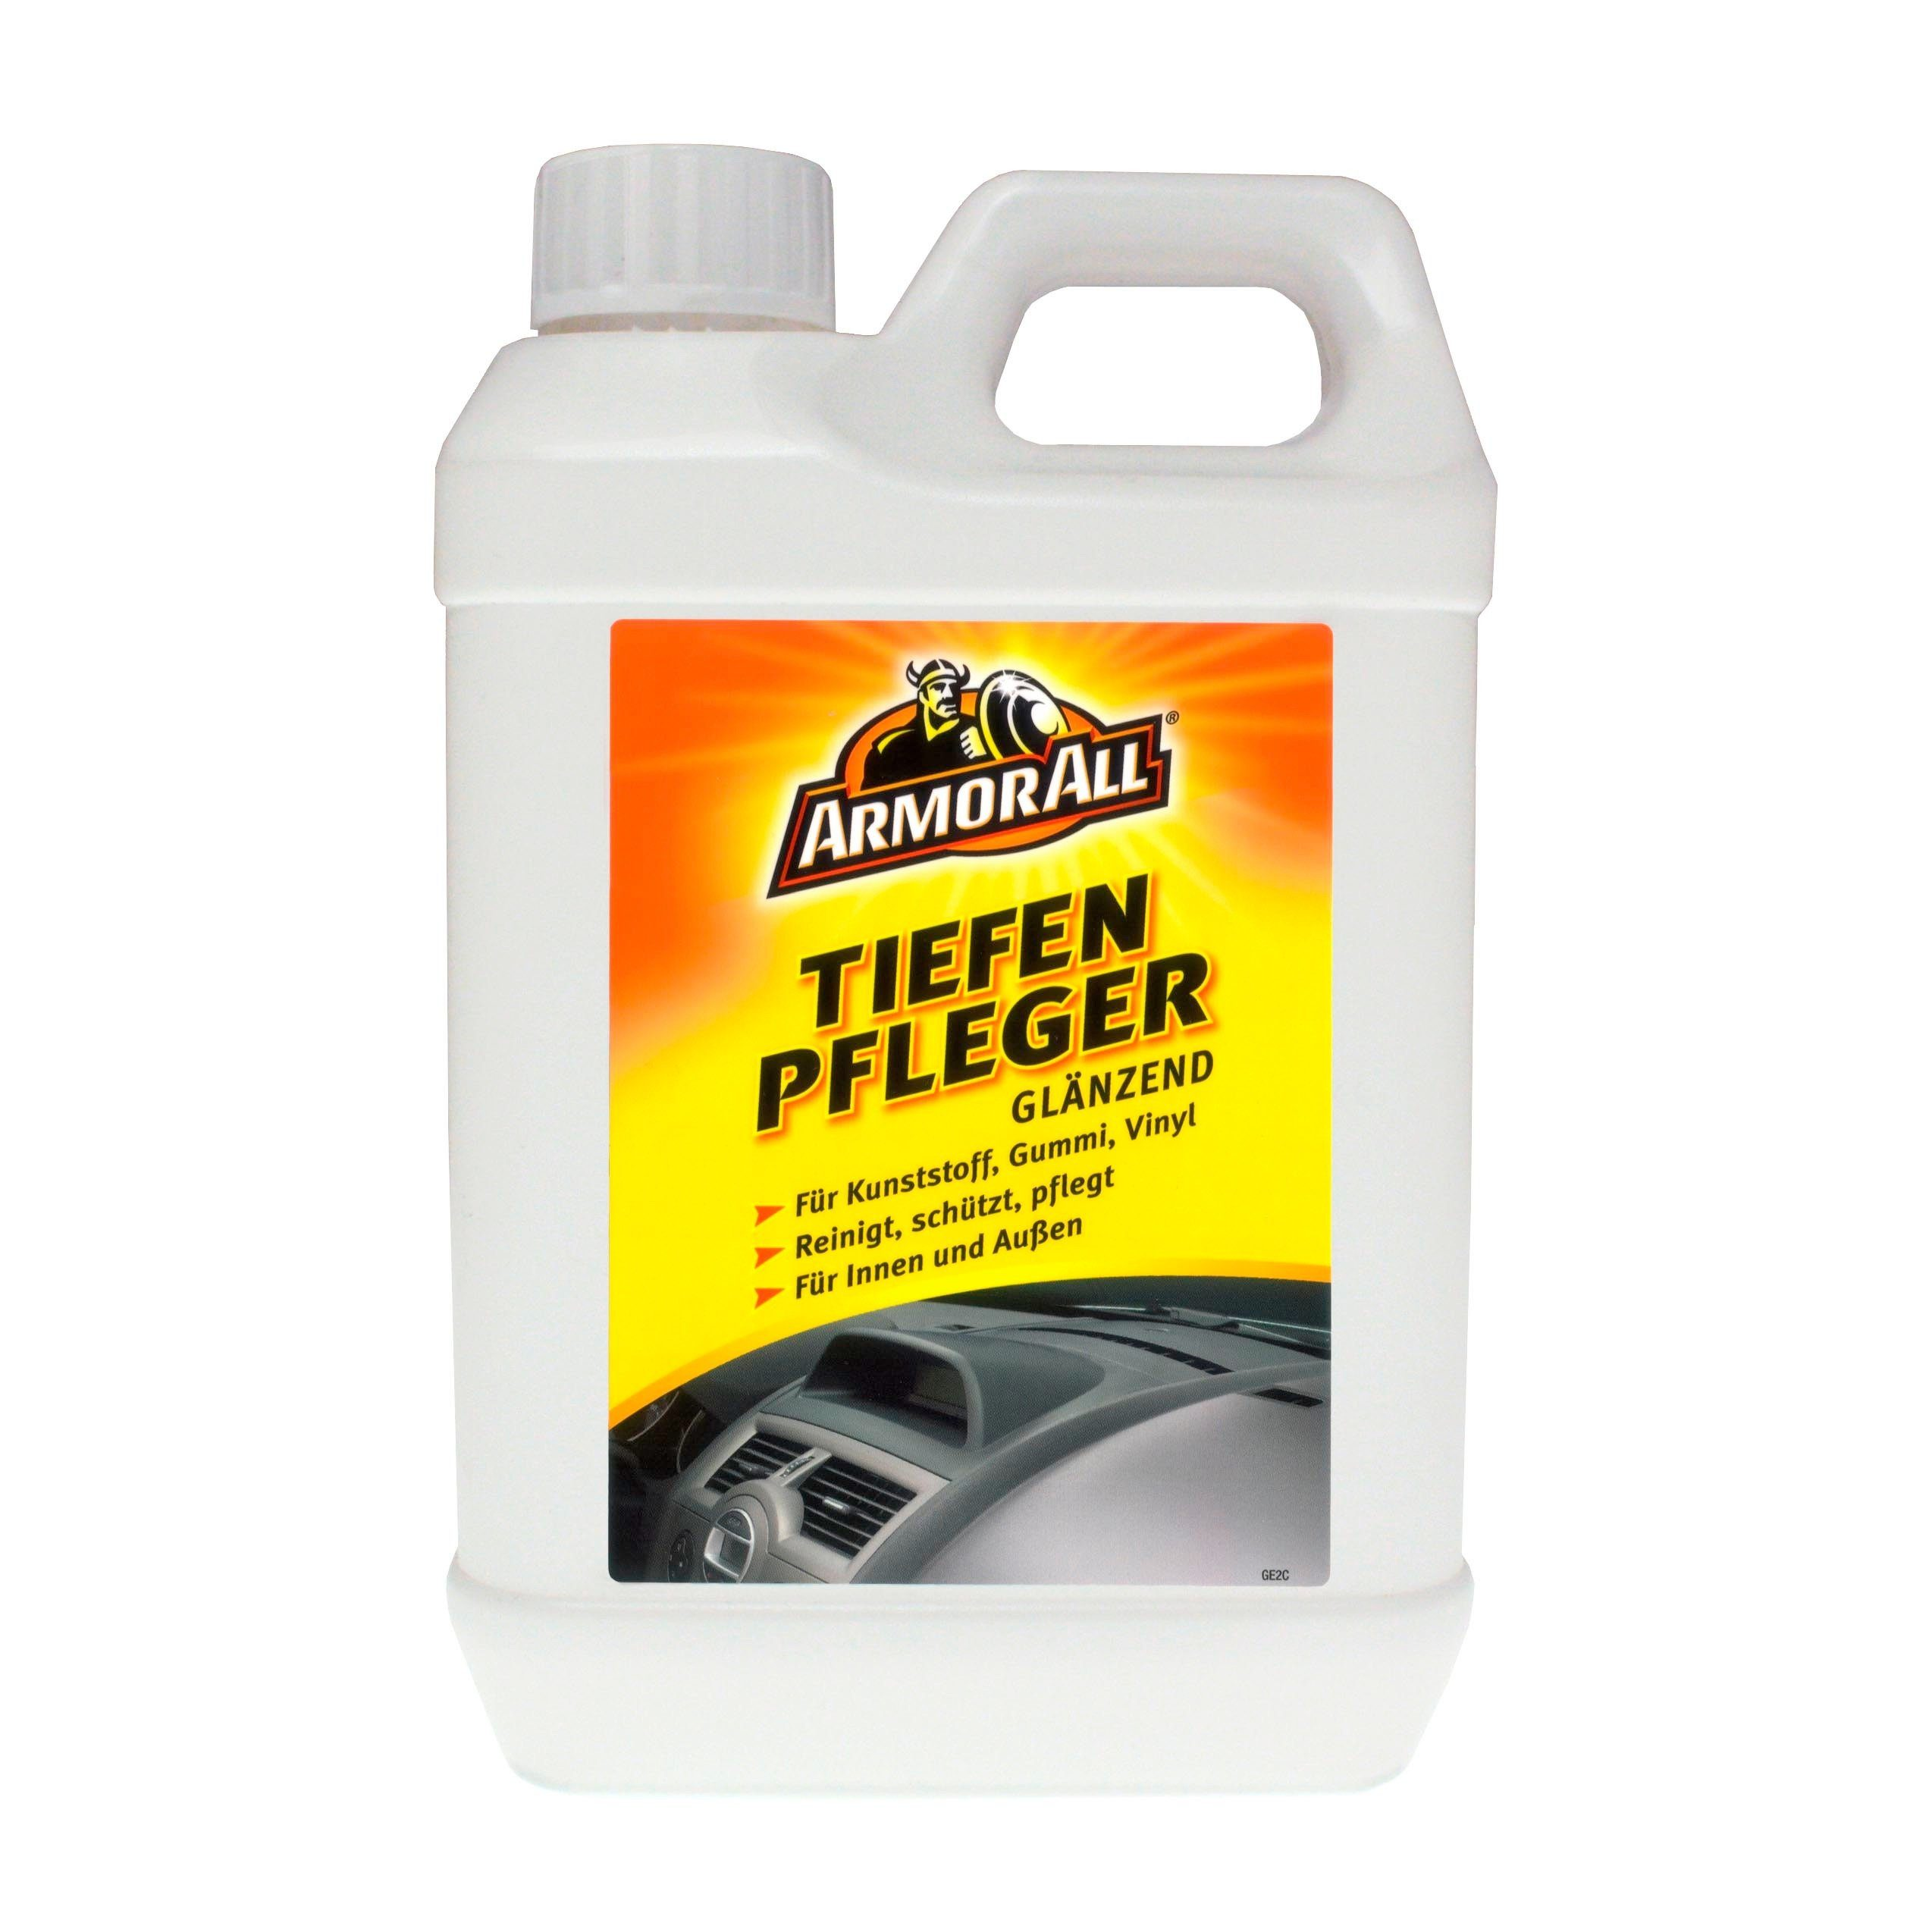 Autopflege »Armor All Kunststoff Tiefenpfleger Glänzend«